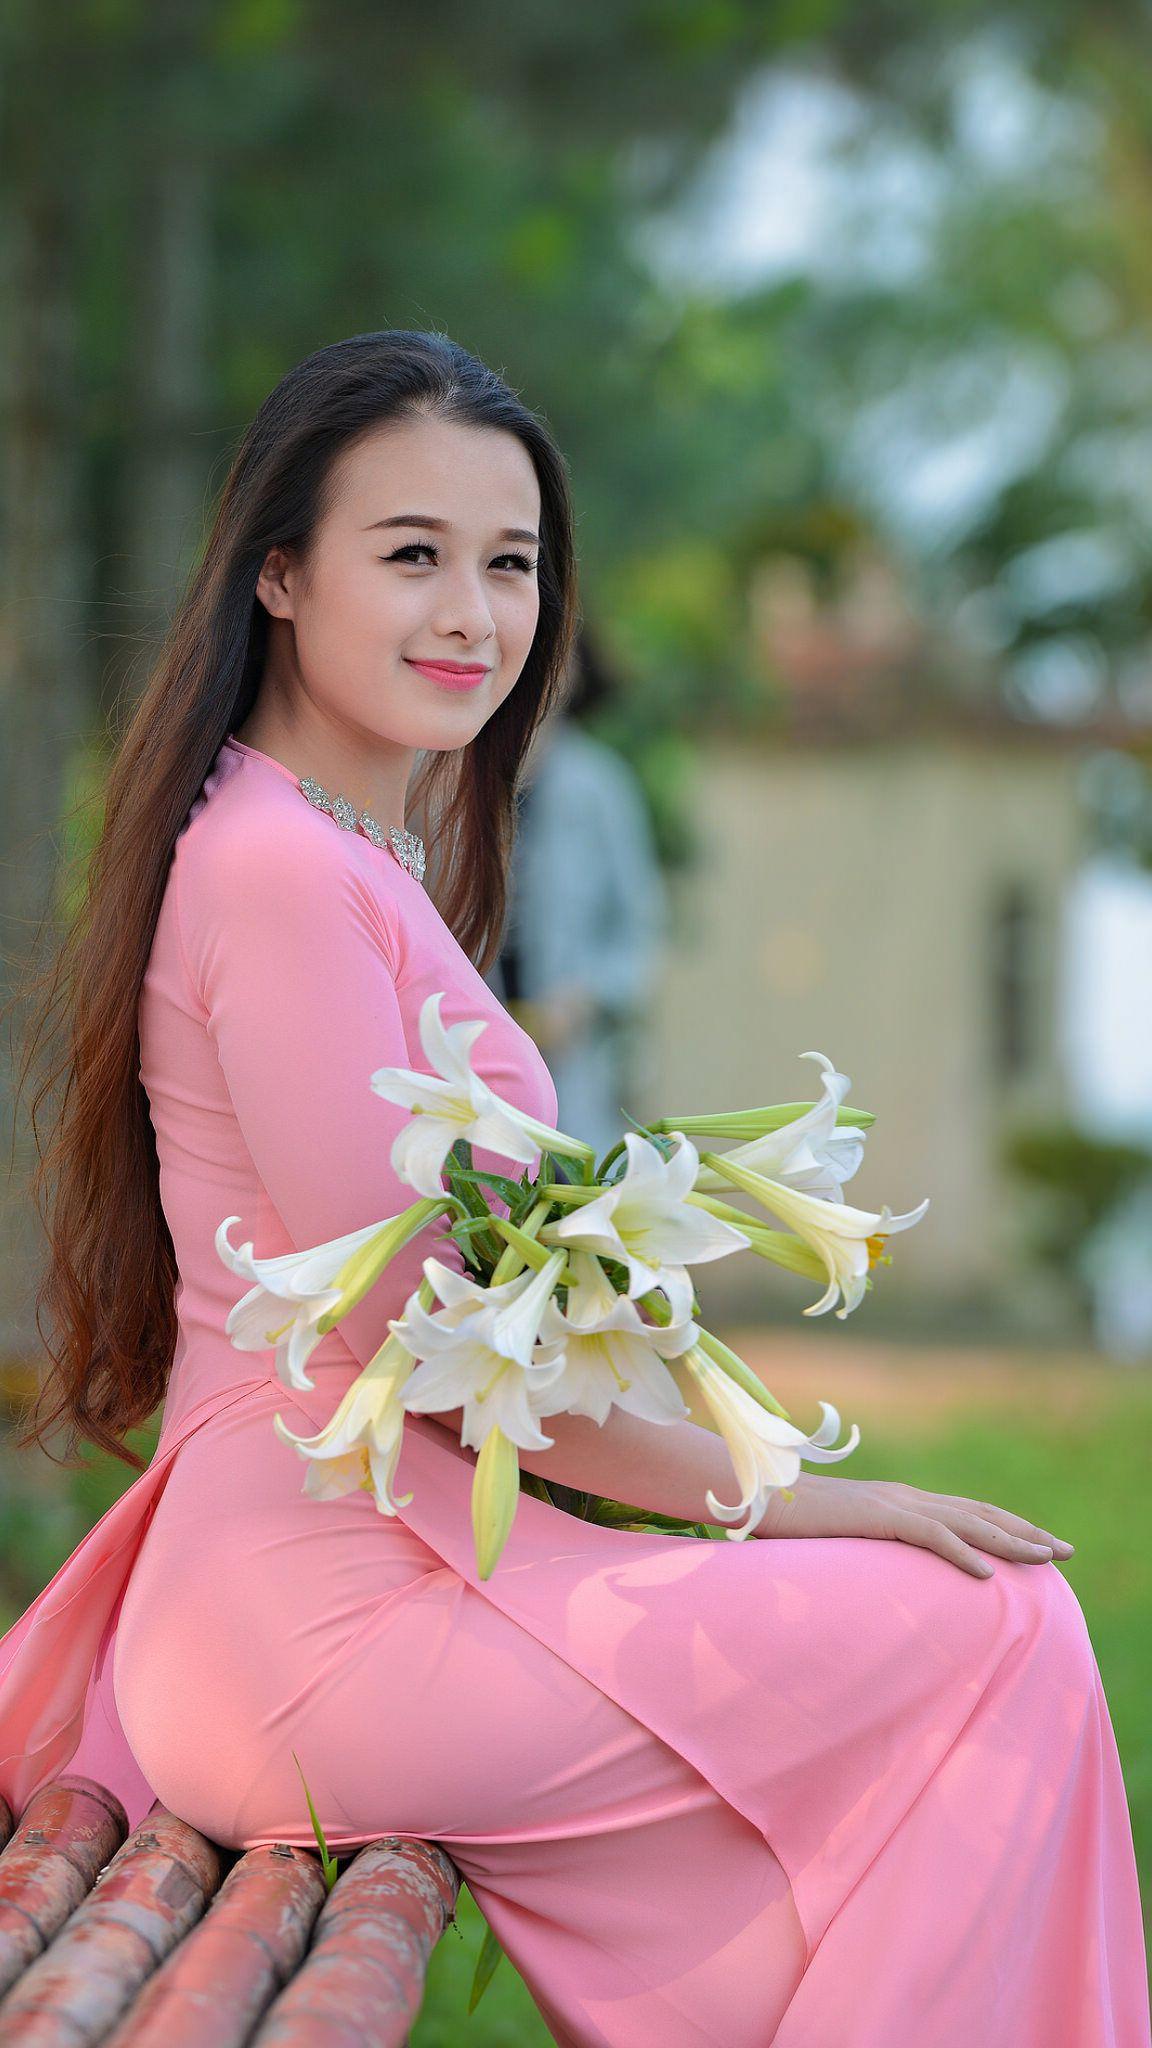 Pin de Trancuongdad@gmail.com en Vietnamese long dress 1 | Pinterest ...